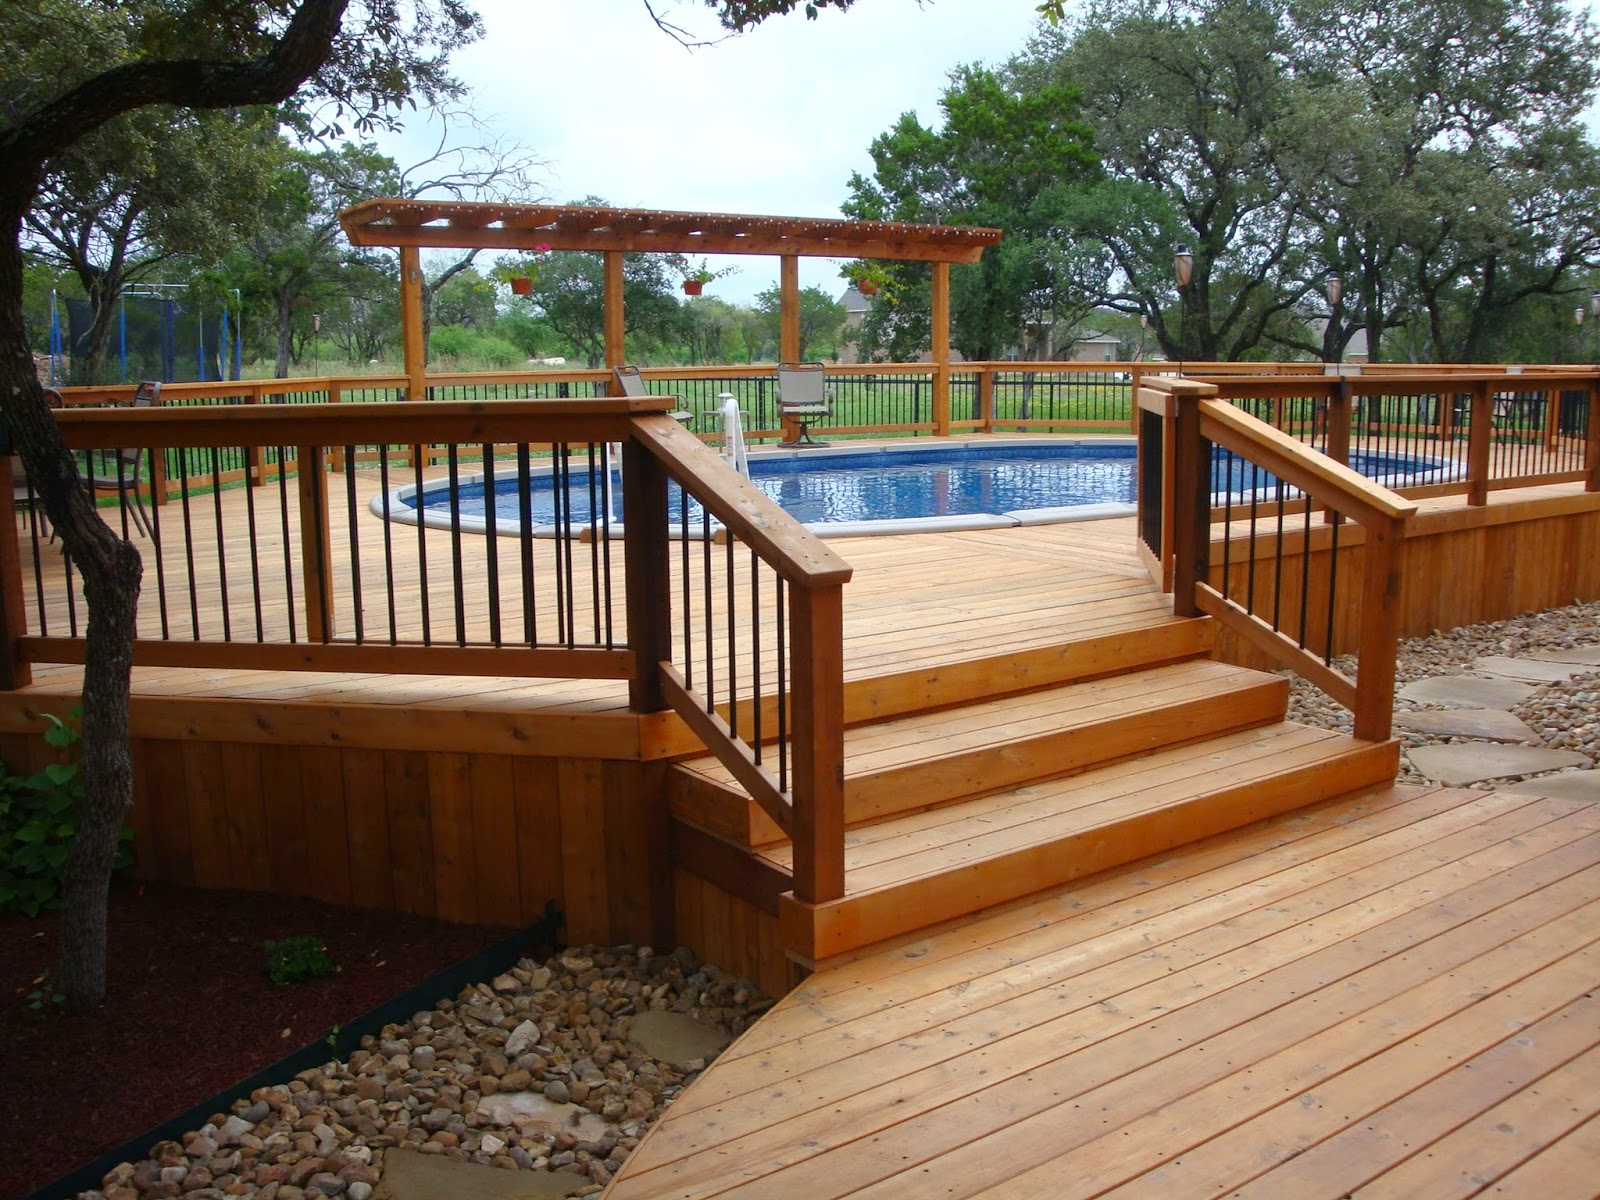 wooden decks design ideas amazing modern pool deck design for swimming pool design ideas interior design - Wood Deck Design Ideas